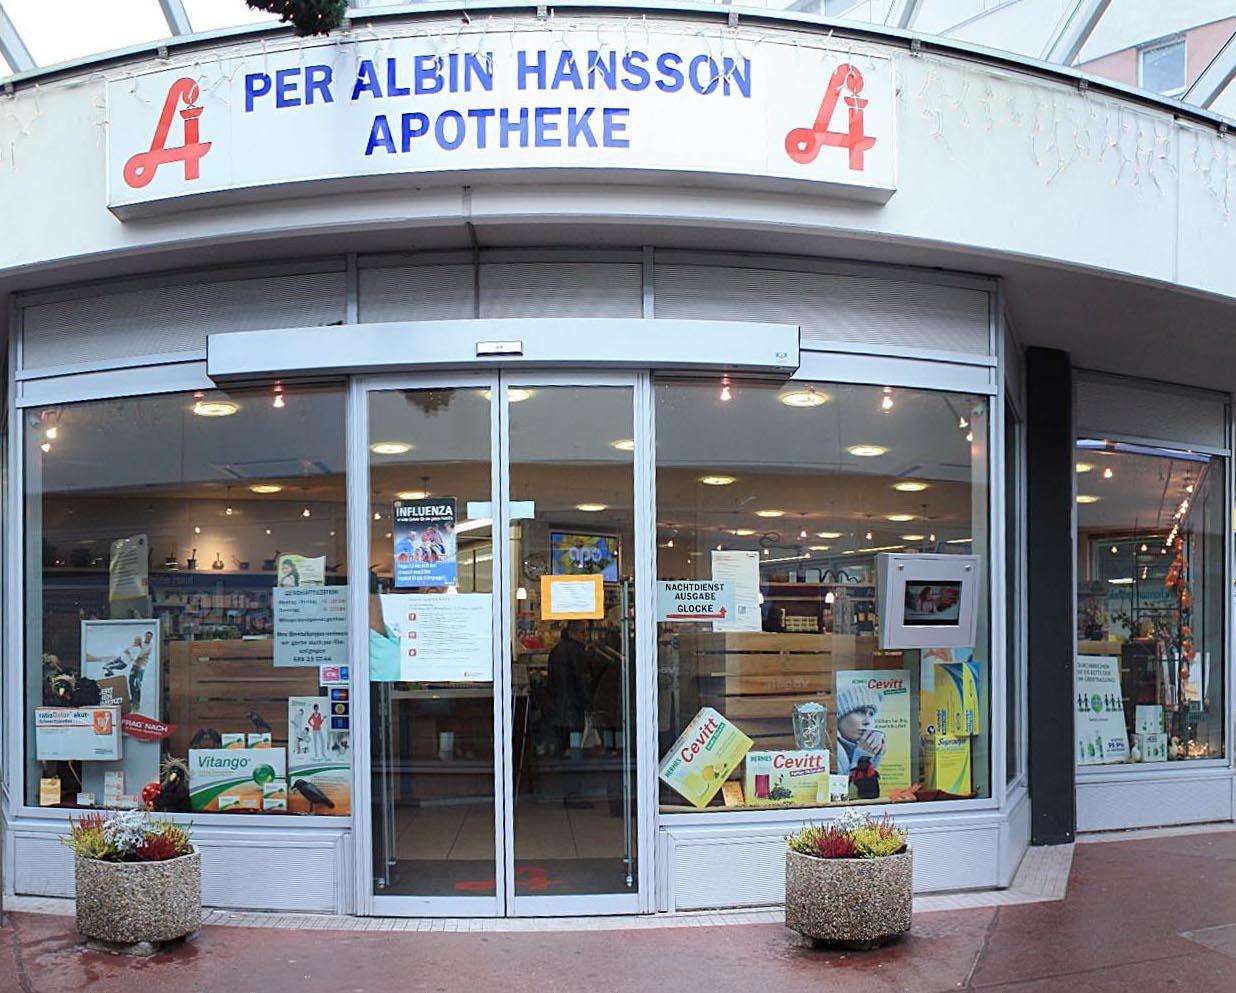 start per albin hansson apotheke ihre go well apotheke. Black Bedroom Furniture Sets. Home Design Ideas